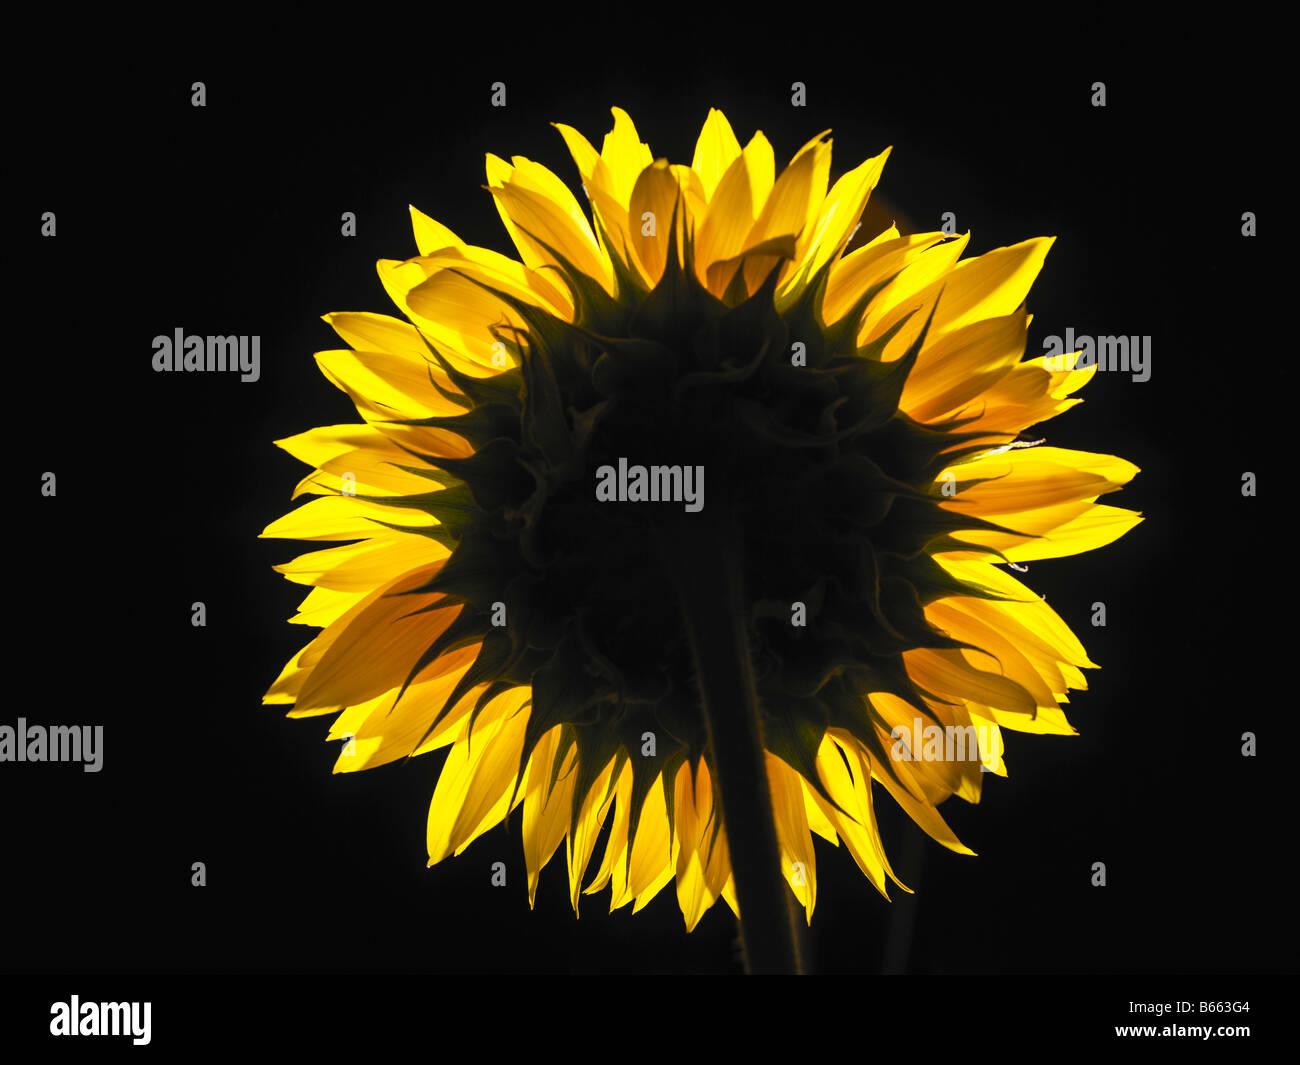 sunflower backlight in a studio setting - Stock Image